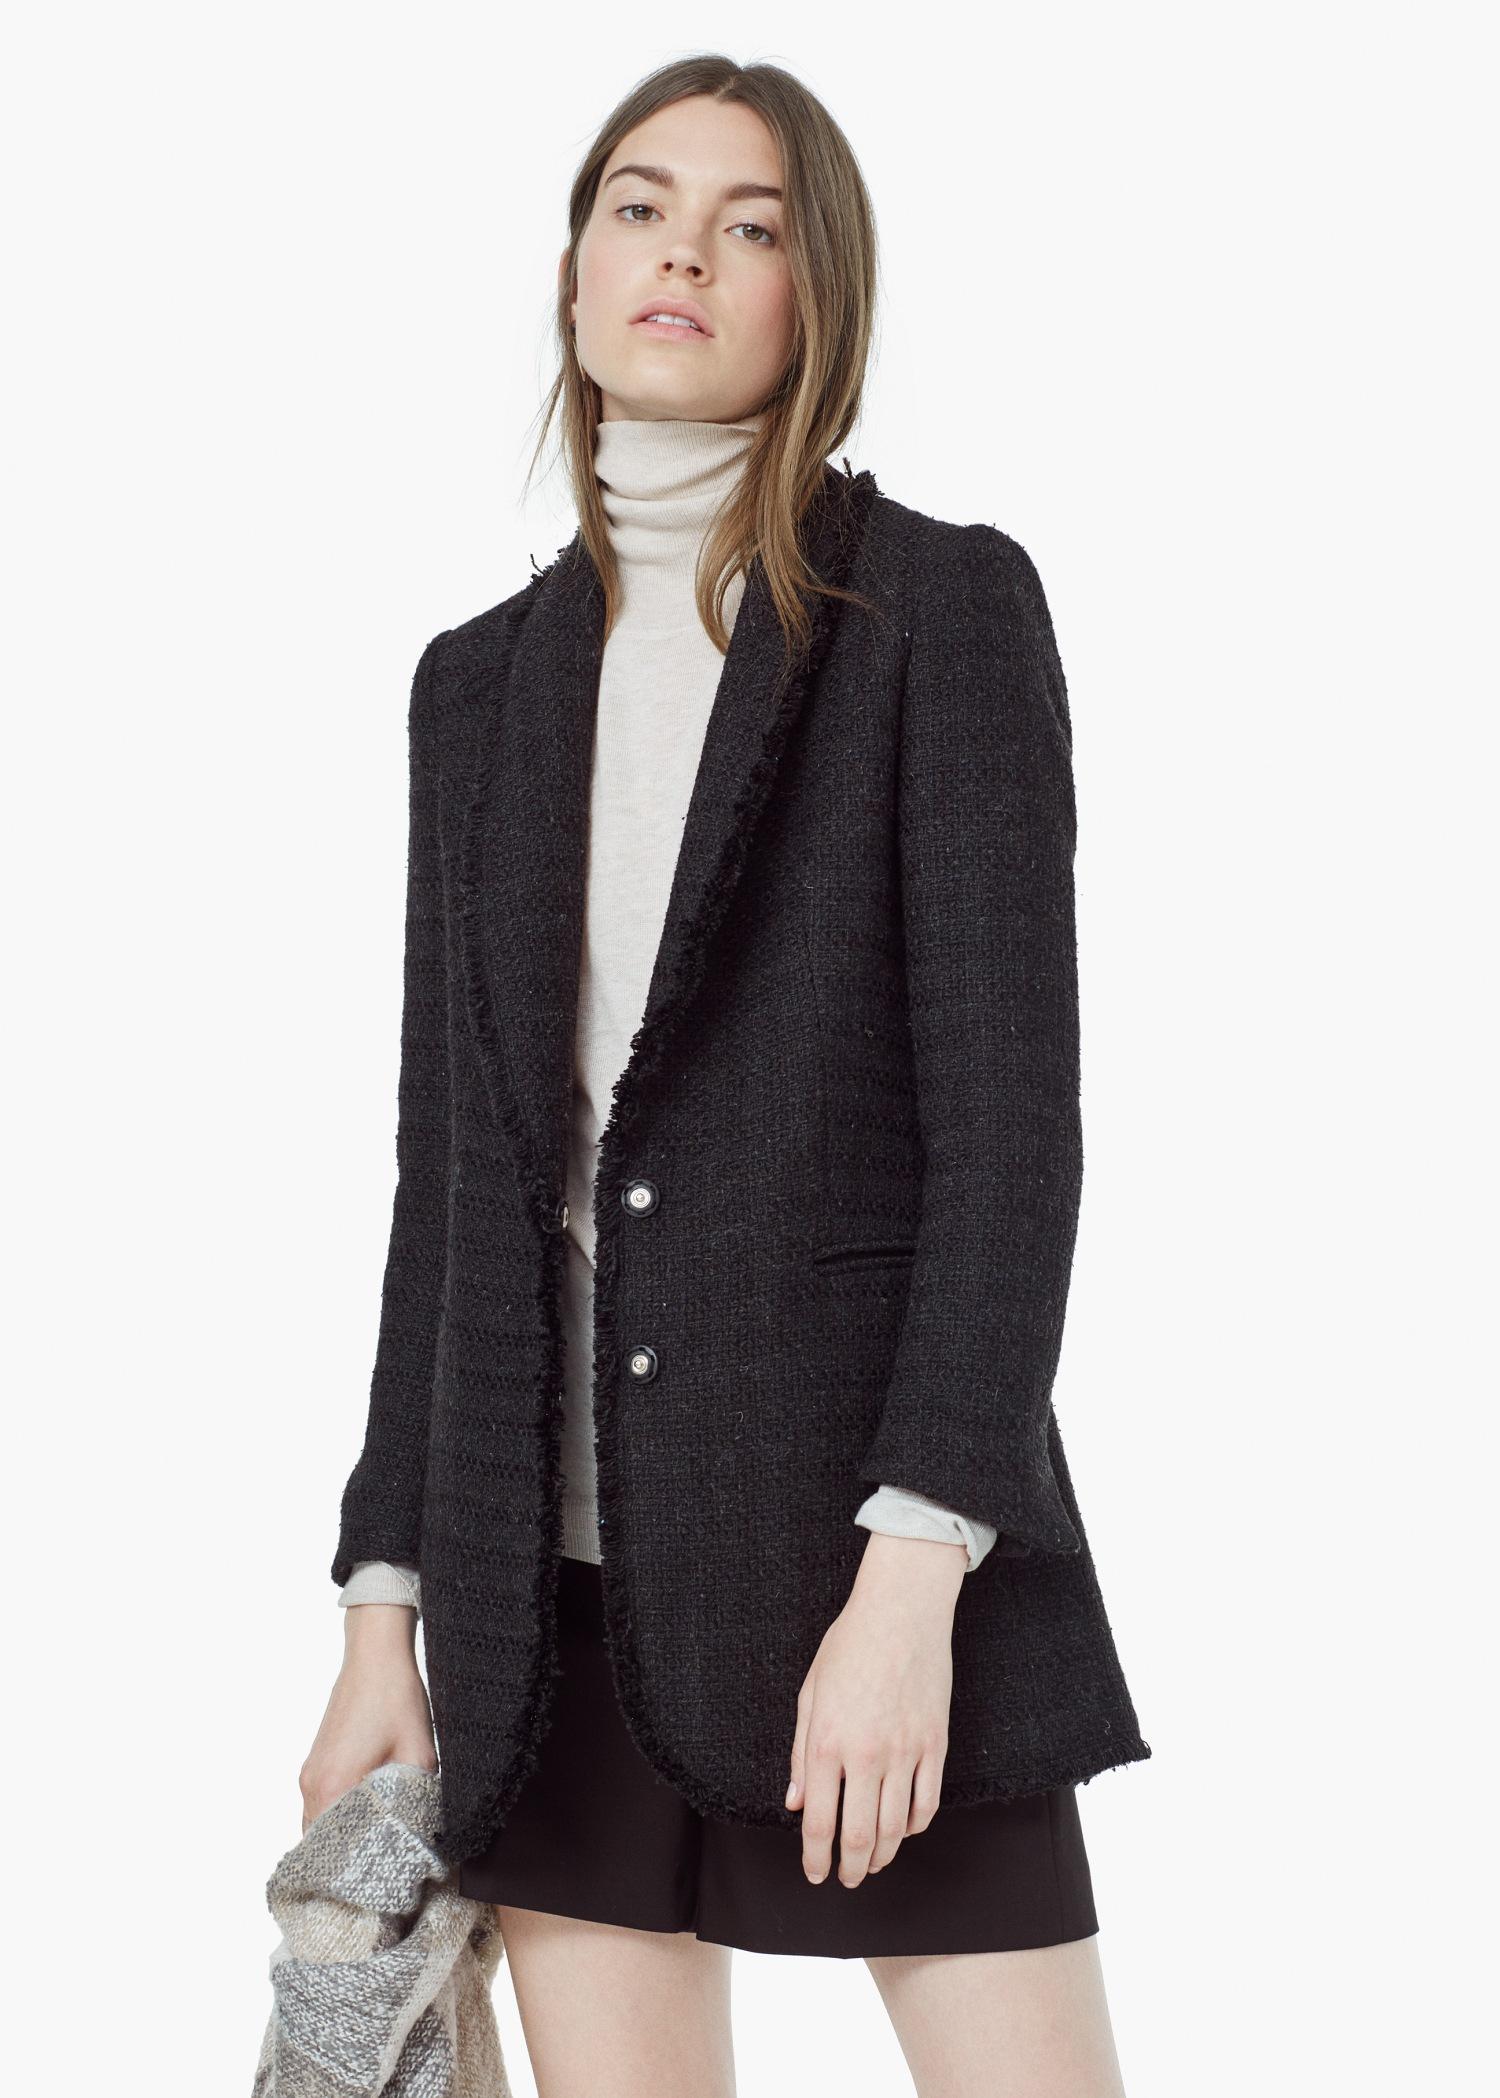 Lyst - Mango Pocket Tweed Jacket in Black 695c70087eb1